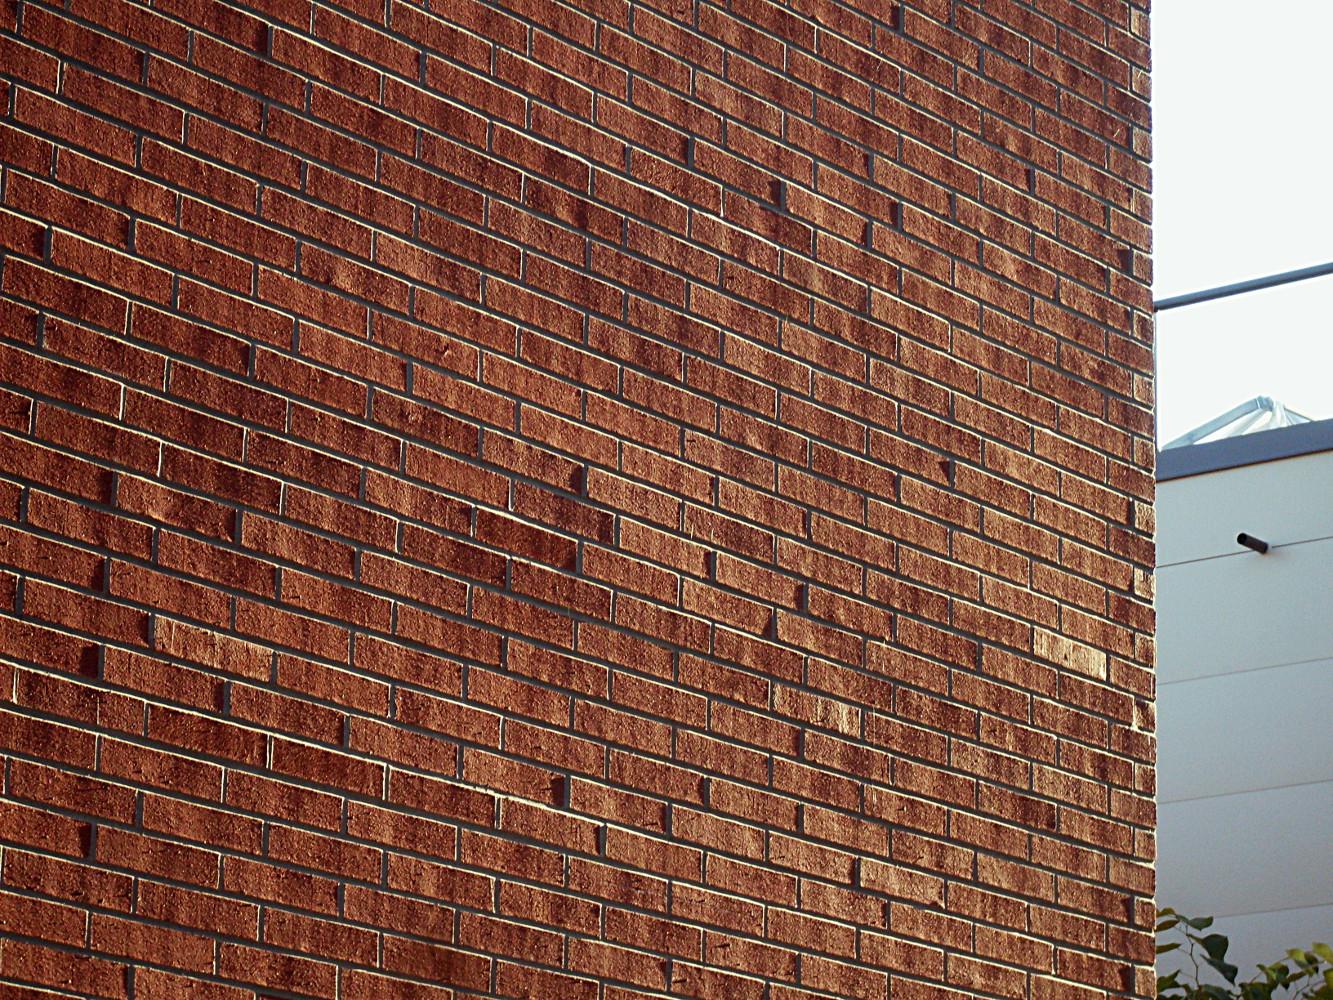 ценами стена дома из кирпича картинки архитектурную